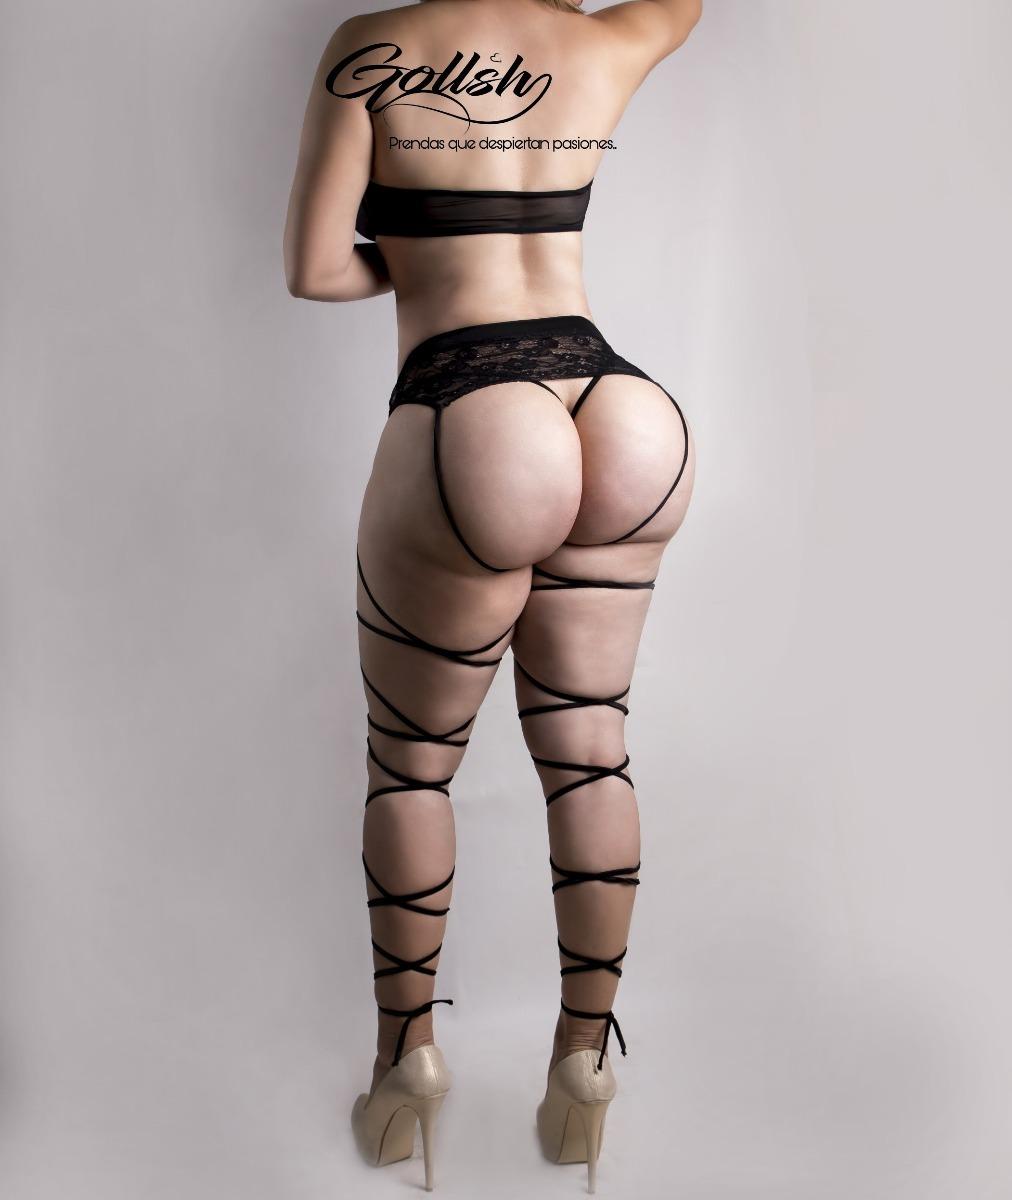 7afb71ca94b8 Liguero Incluye La Tanga Y Top Negro Lenceria Sexy Mujer - $ 599.00 ...